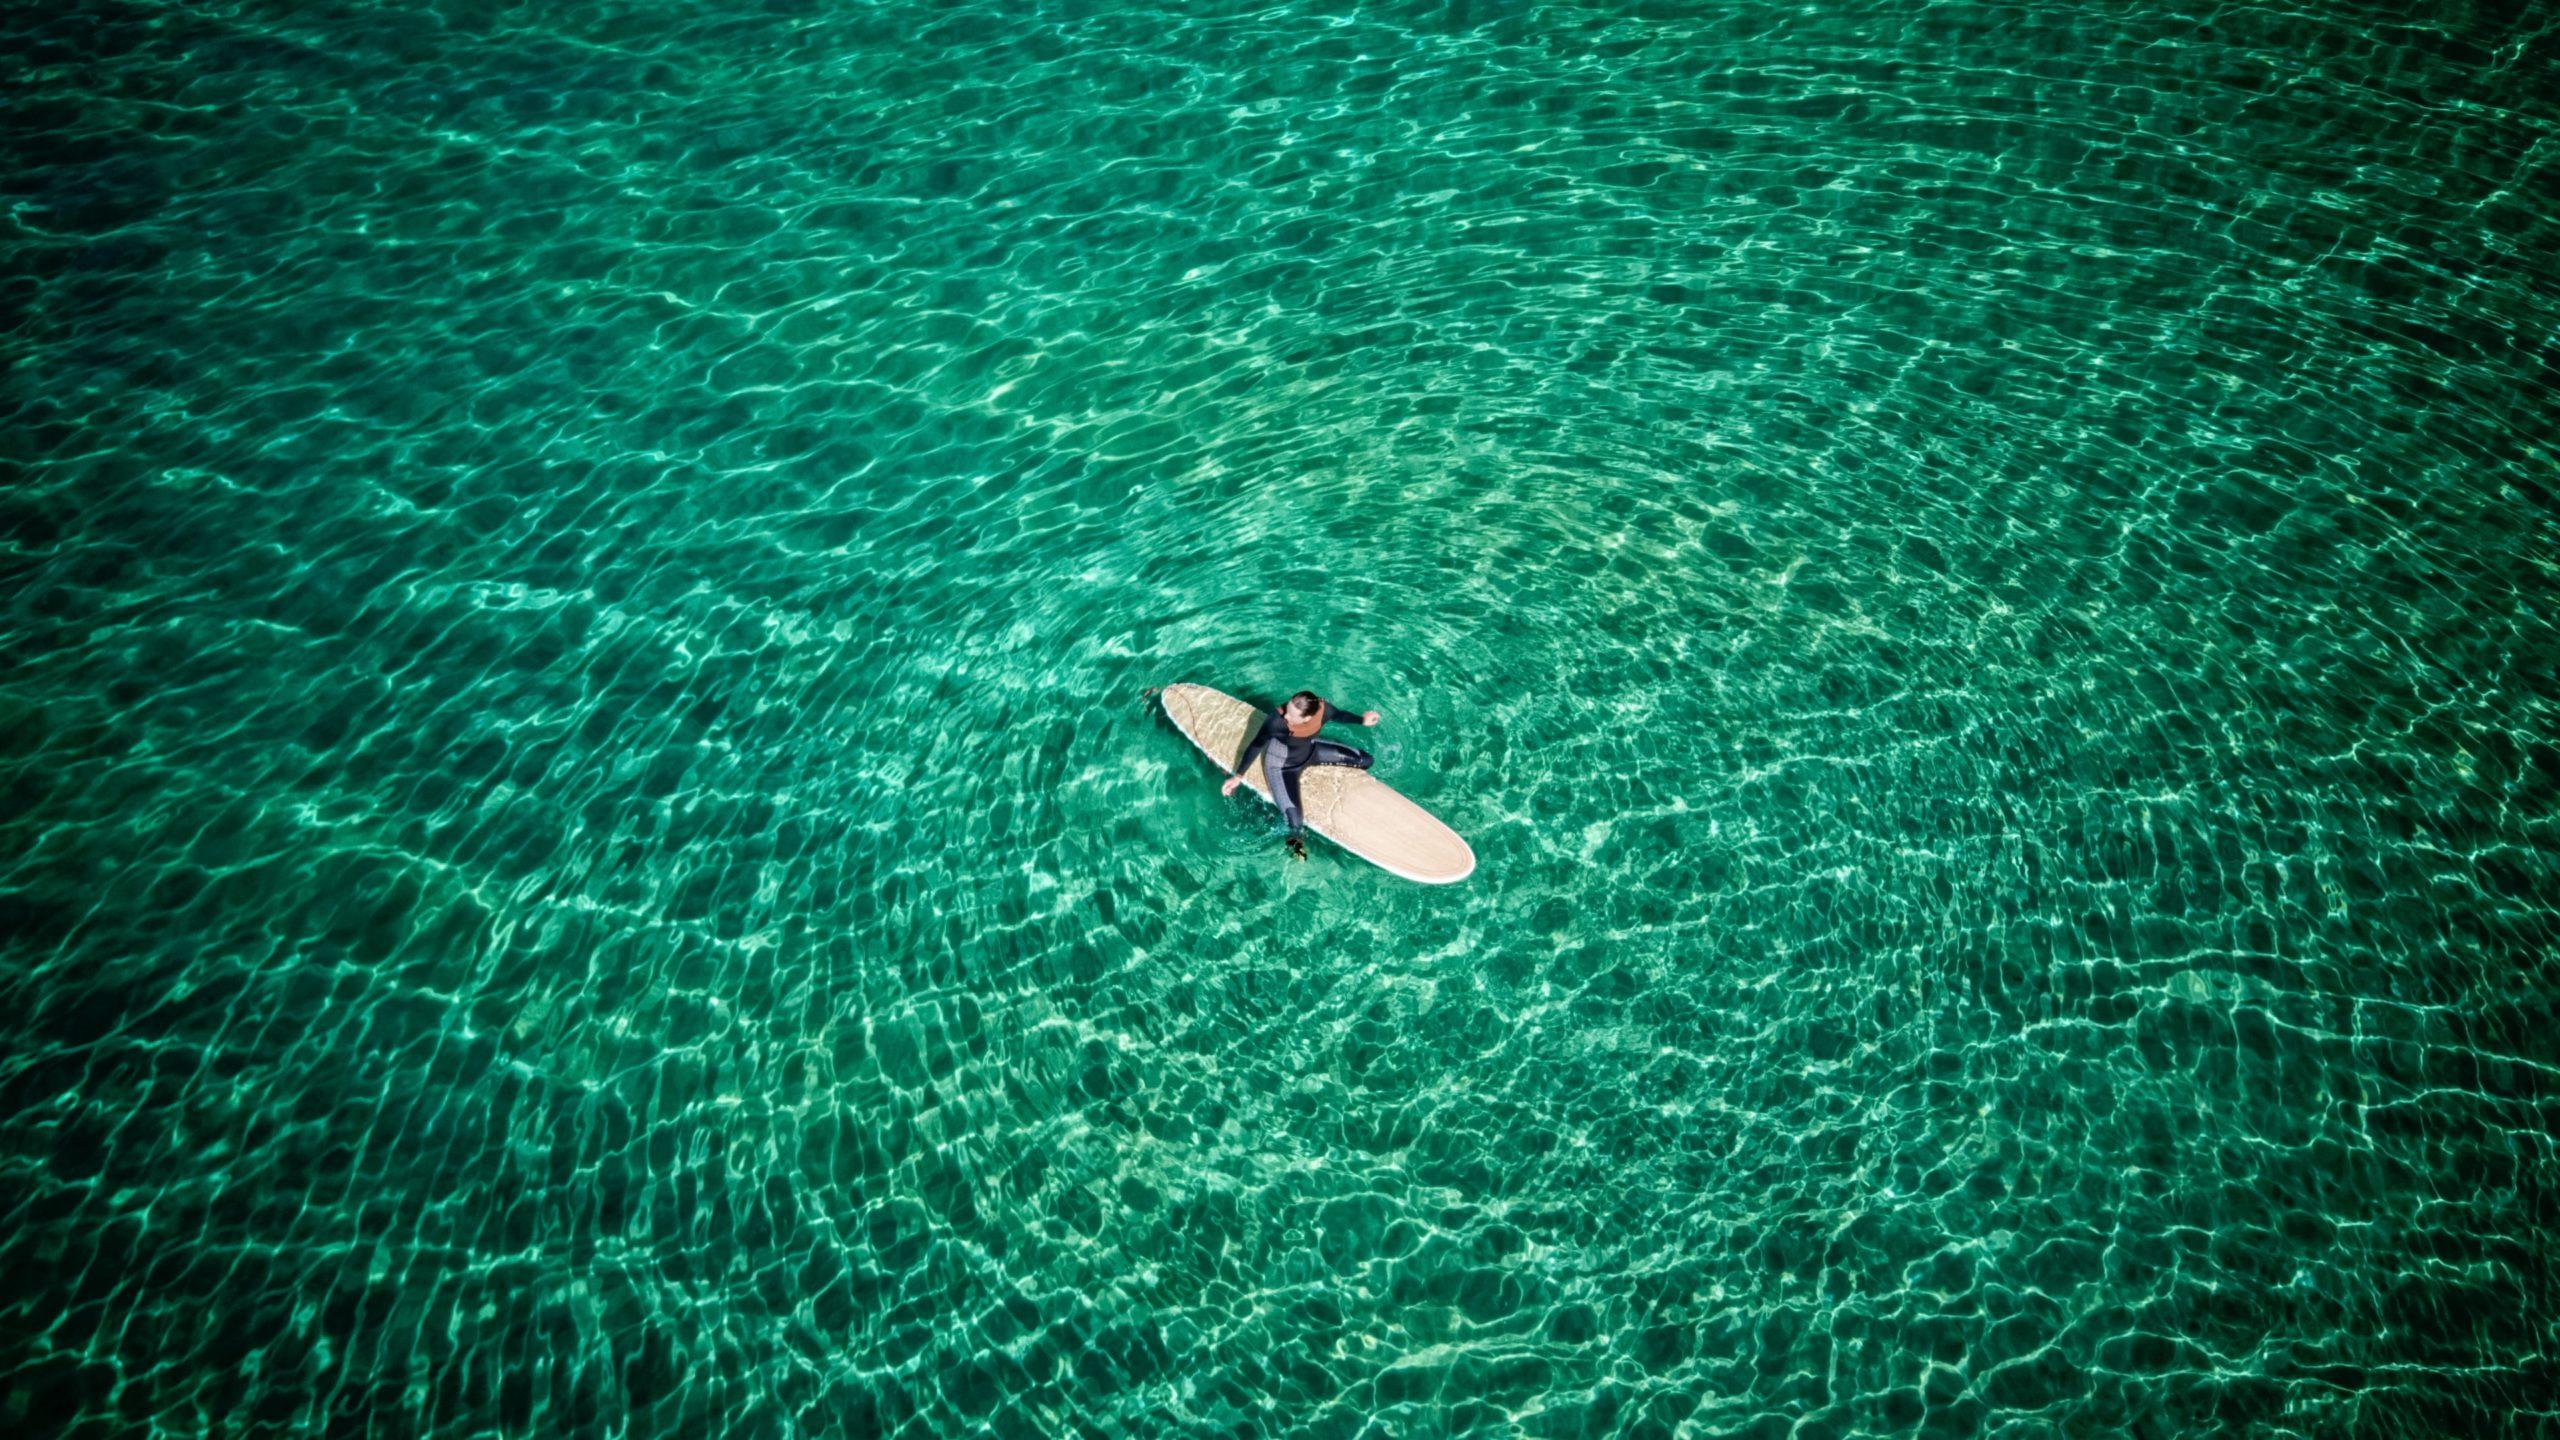 Unsere Top 9 Surfspots in Europa